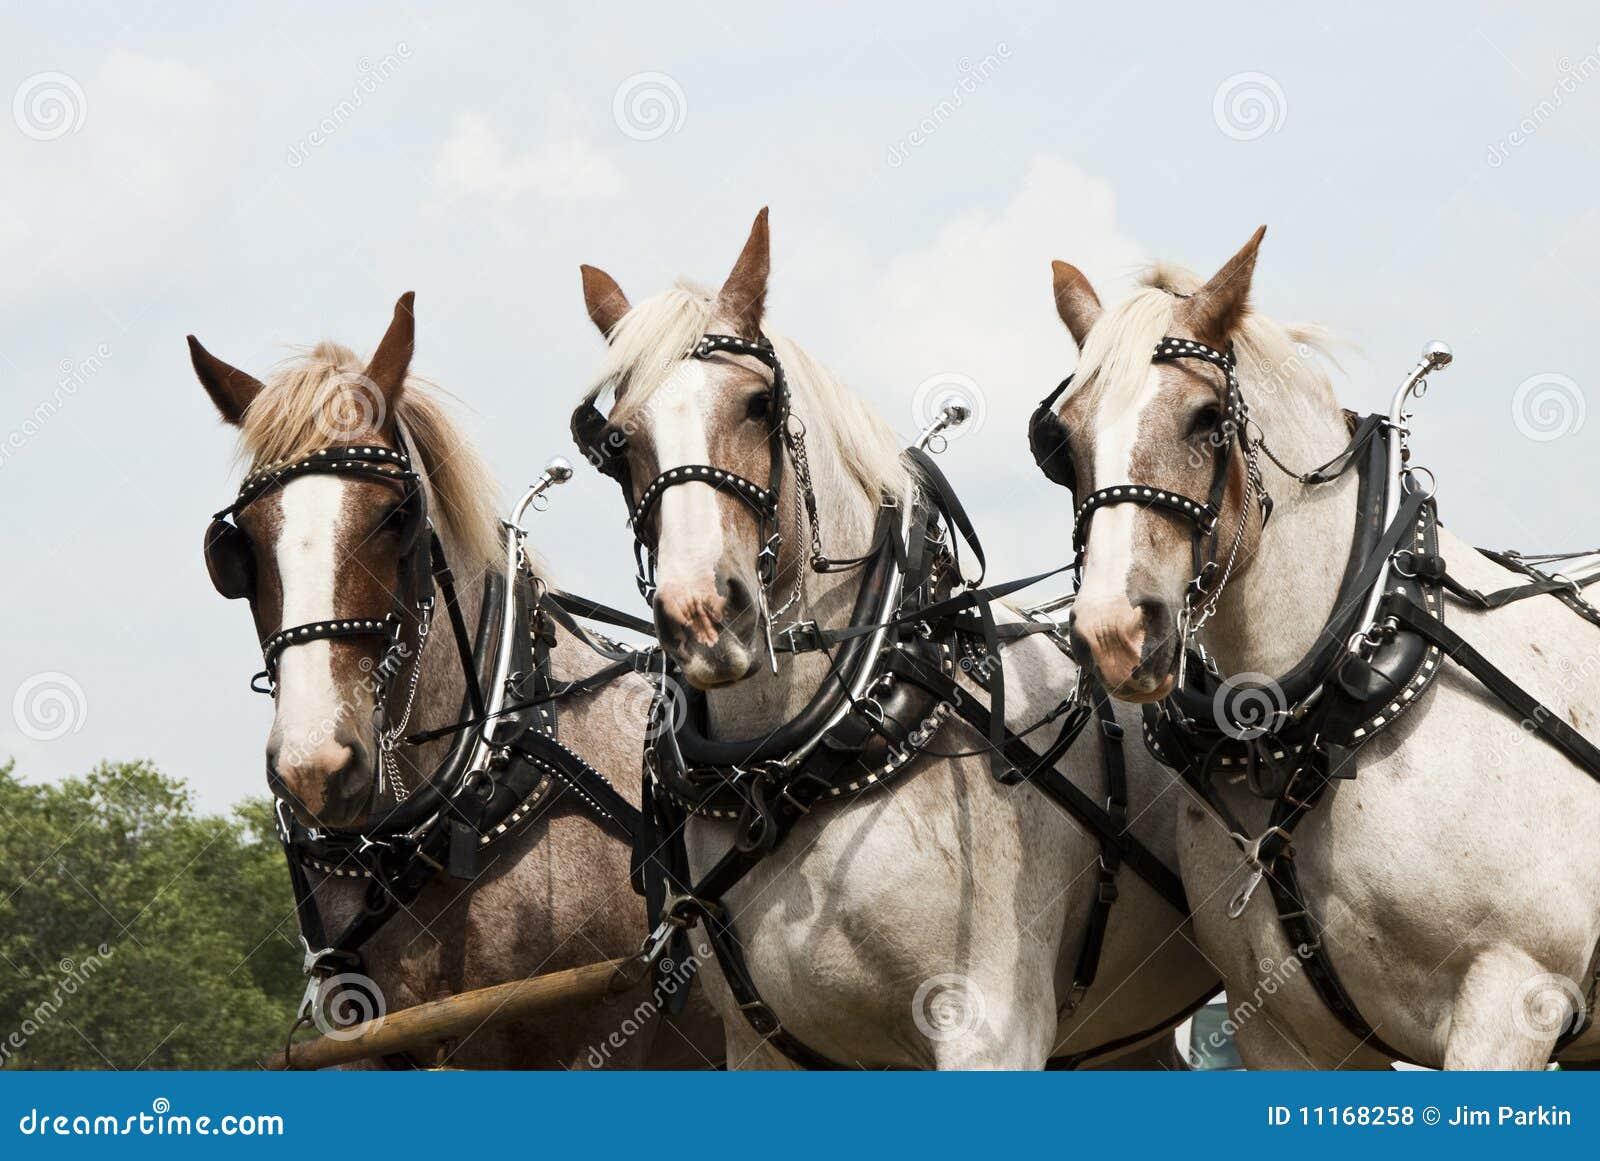 Horse-drawn de landbouwdemonstraties